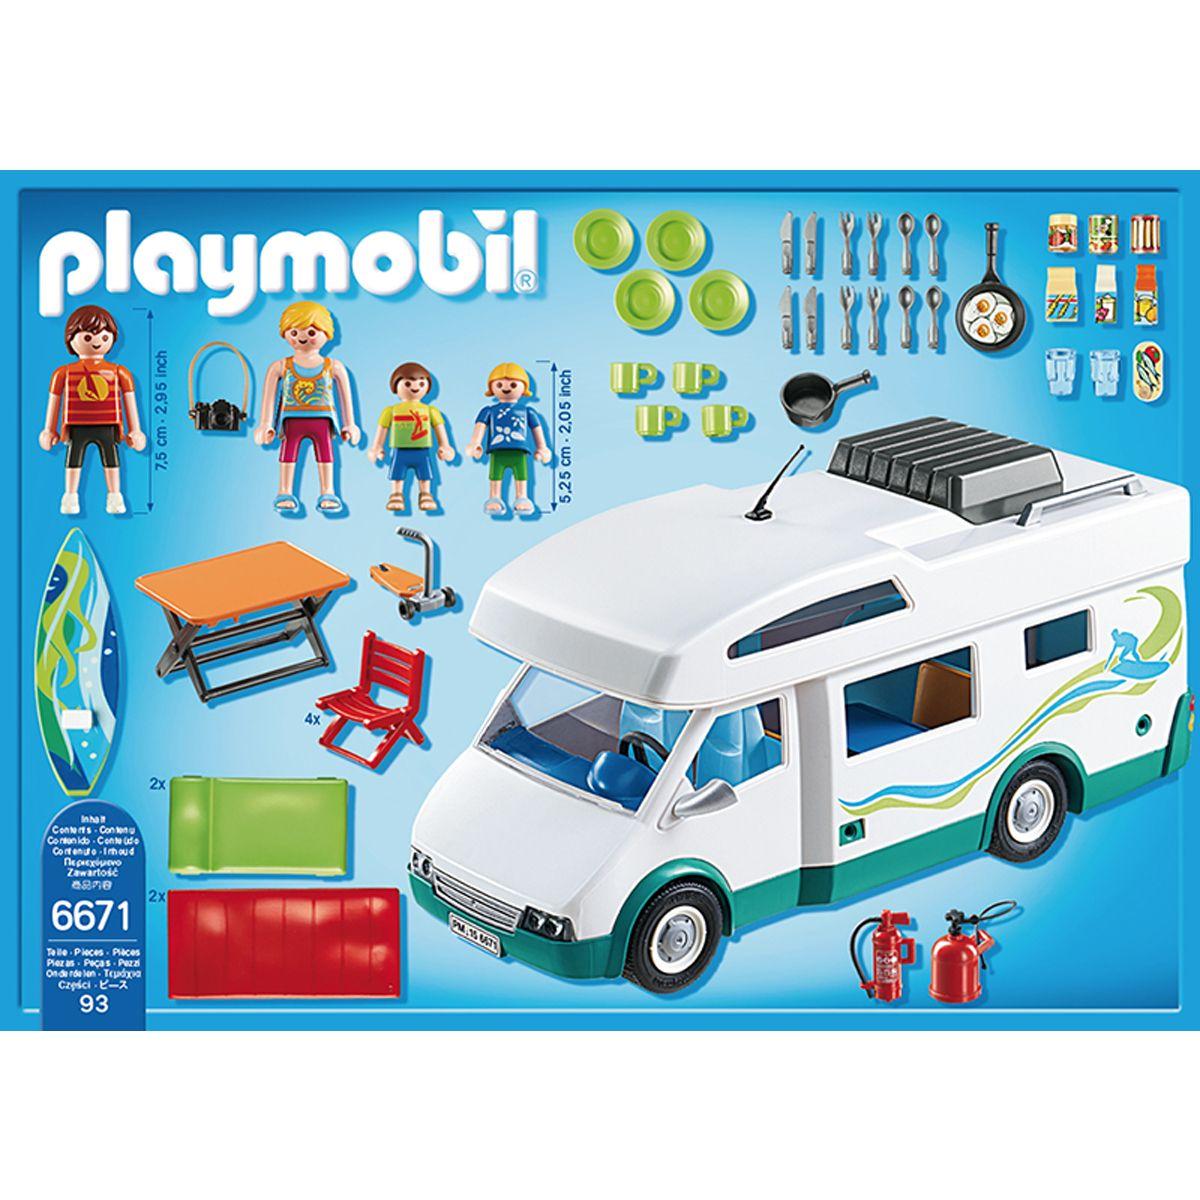 Summer Ville Playmobil La Car Famille Avec Fun Camping 6671 thBdsrCQxo